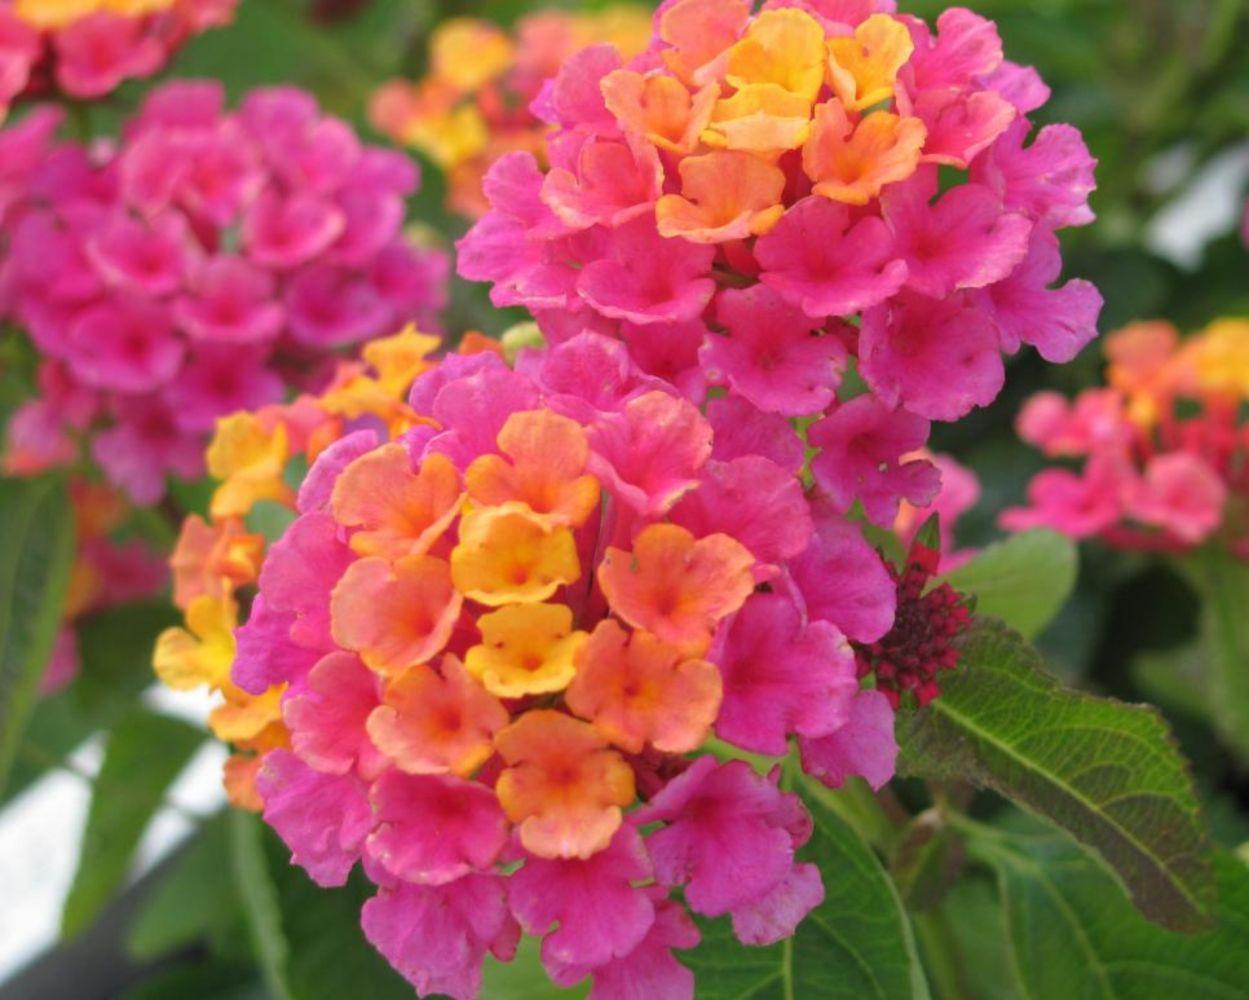 48 gorgeous annual flowers for your garden dream garden gardens 48 gorgeous annual flowers for your garden izmirmasajfo